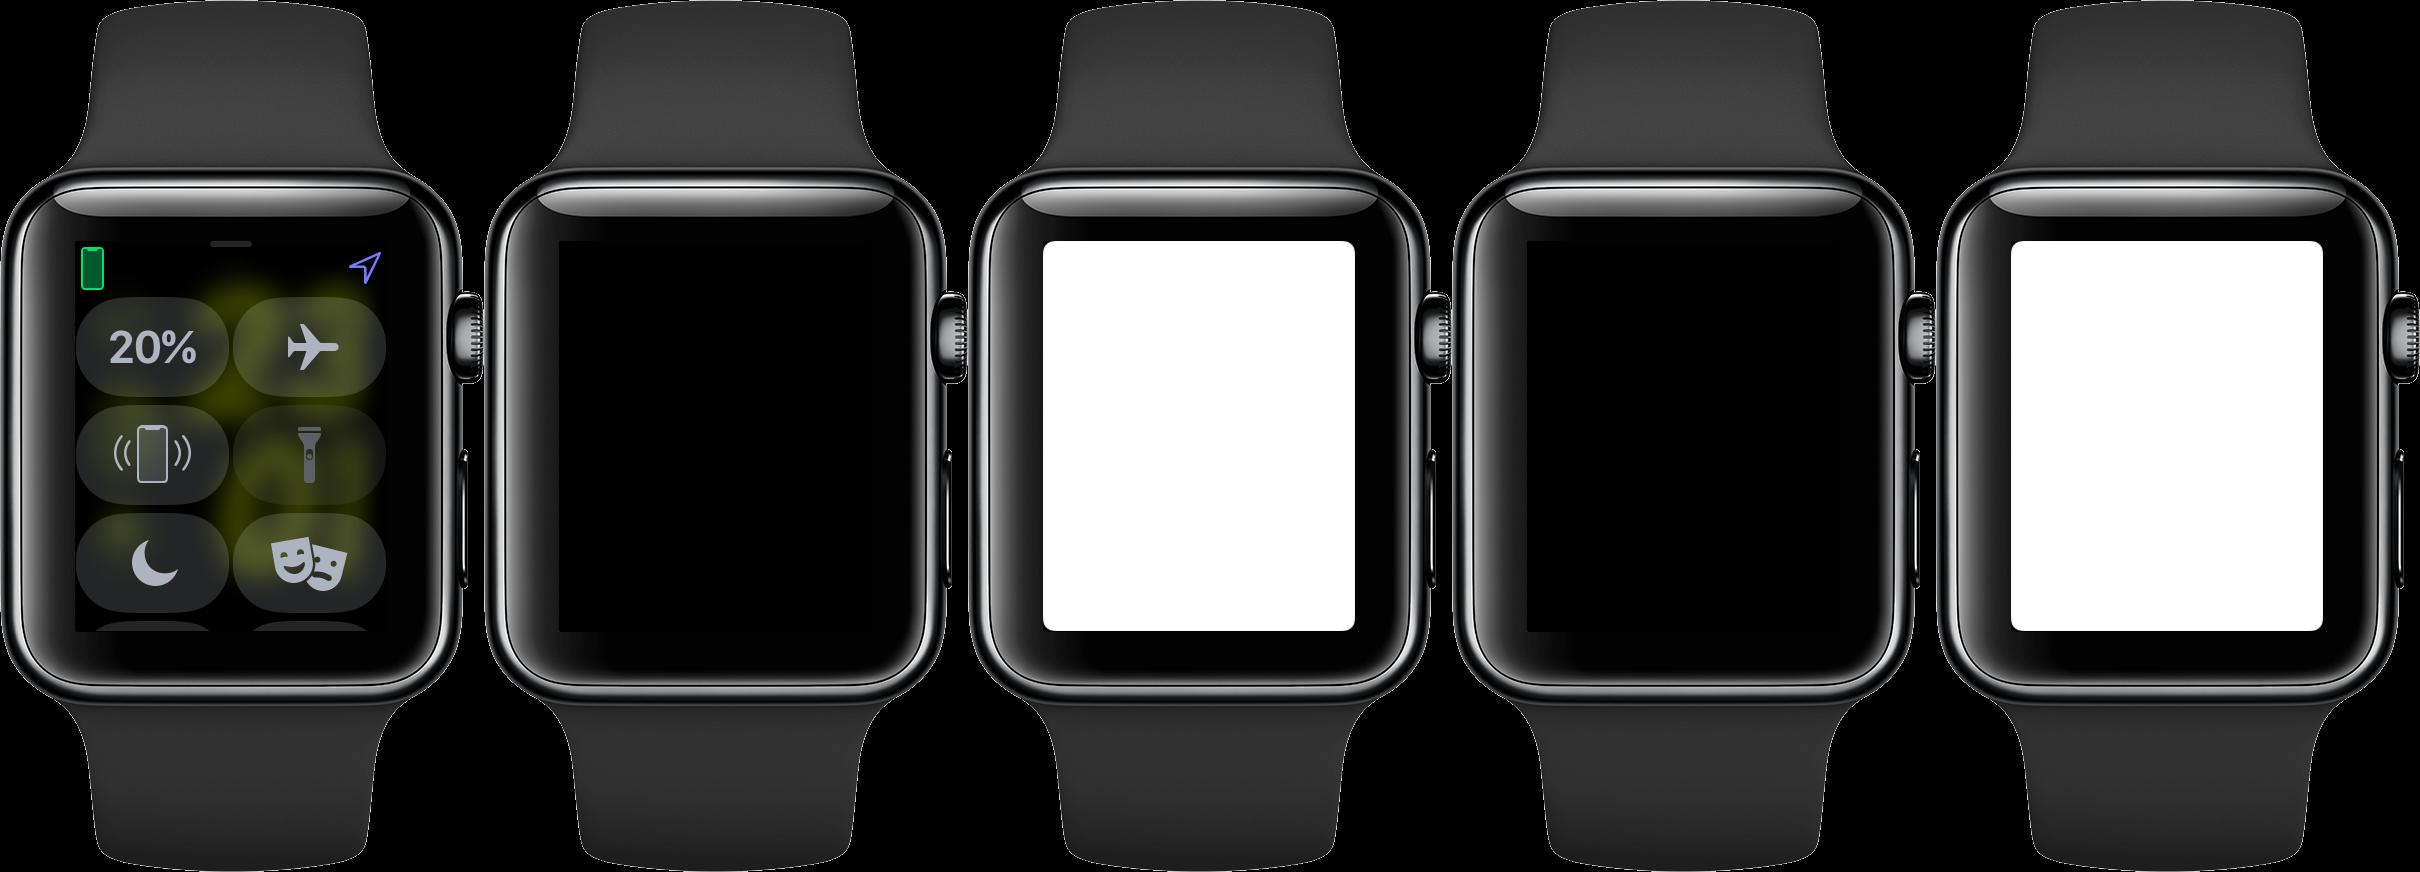 تبدیل apple watch به چراغ قوه